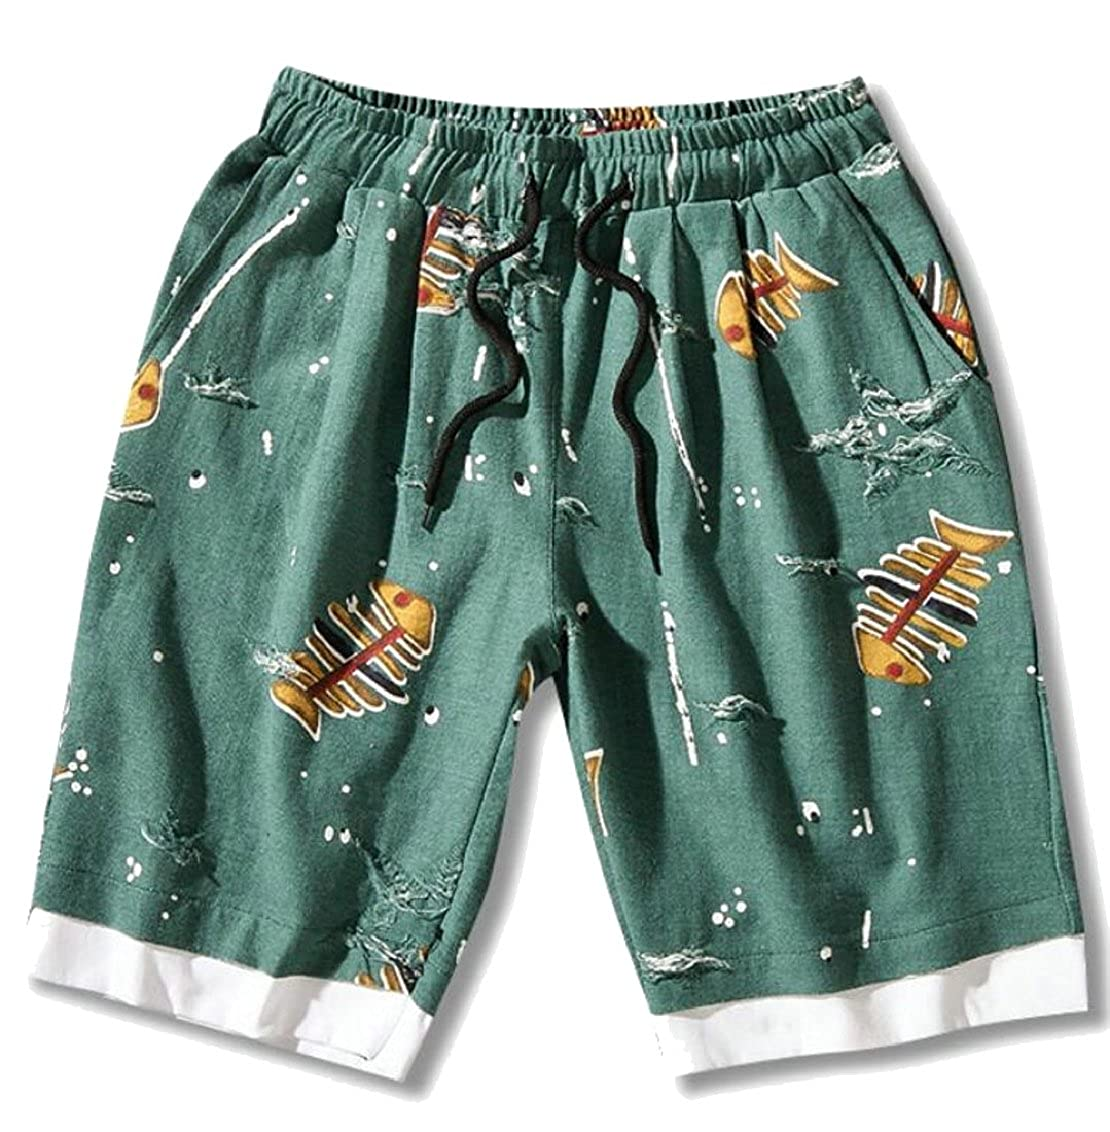 omniscient s Summer Cotton Print Shorts Swimsuit Beach Shorts